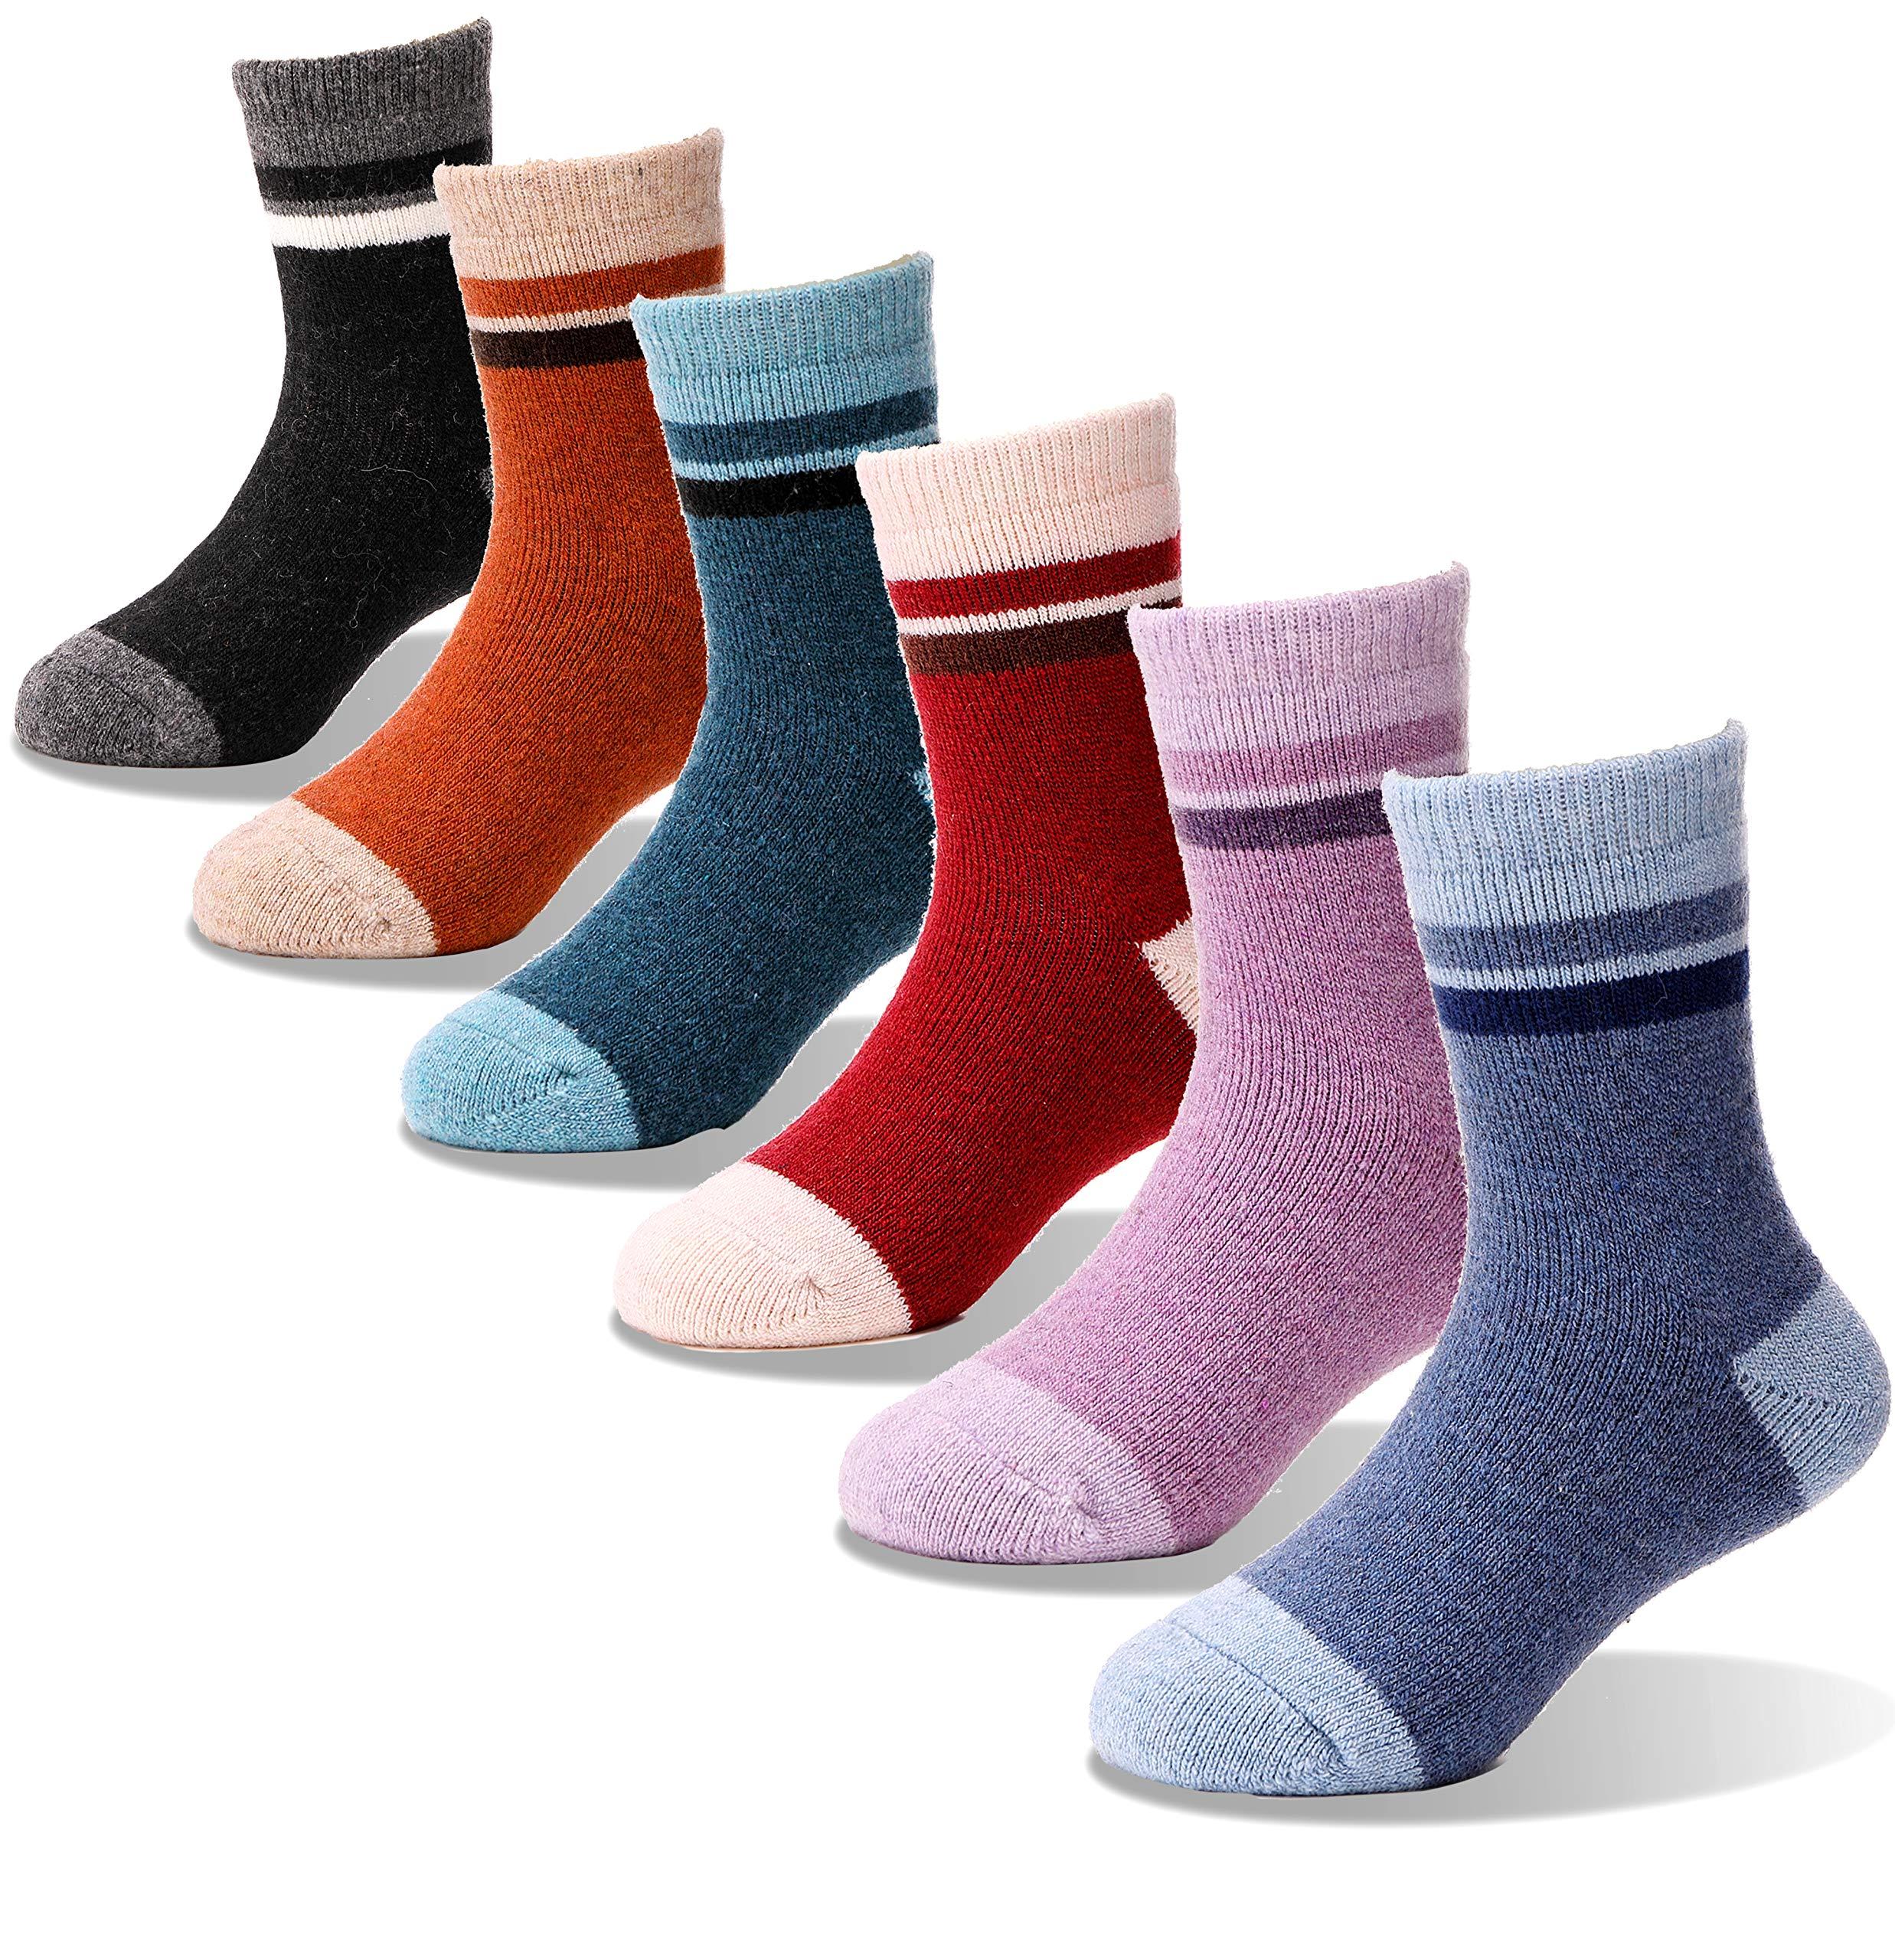 Children Wool Socks For Boy Girl Kids Toddler Thick Thermal Warm Cotton Winter Crew Socks 6 Pack